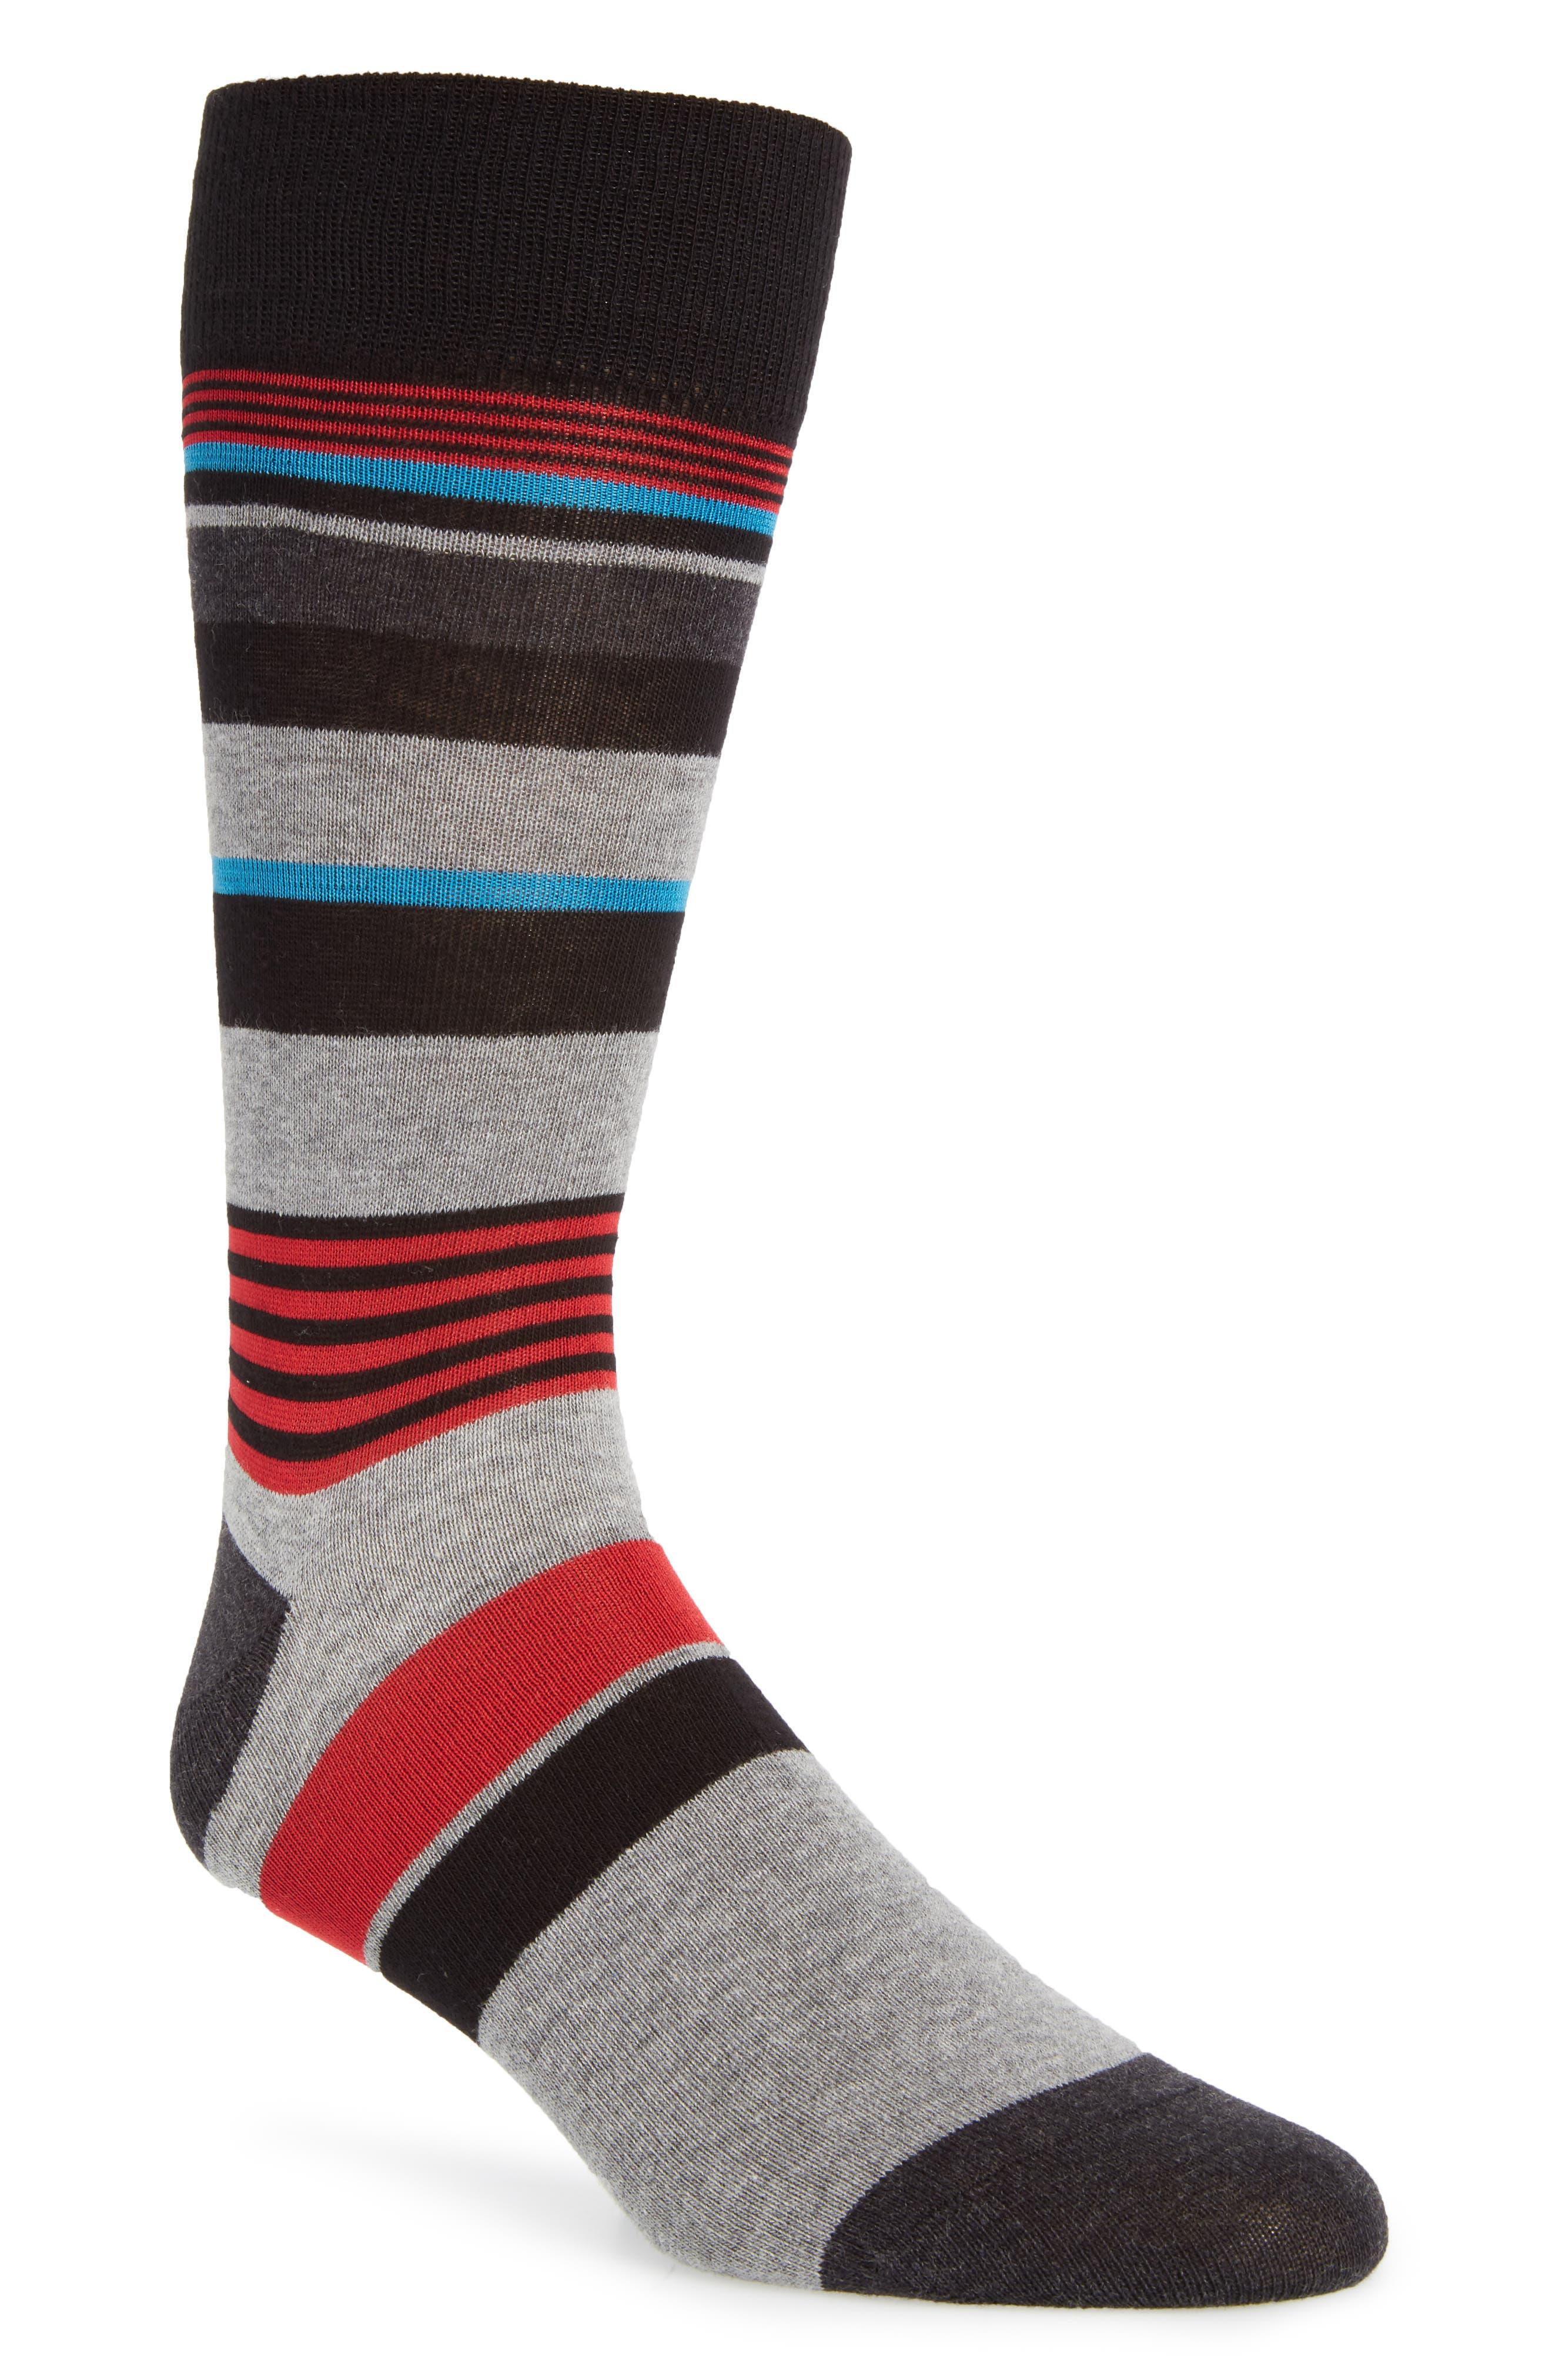 Stripe Socks,                         Main,                         color, Black/ Future Red